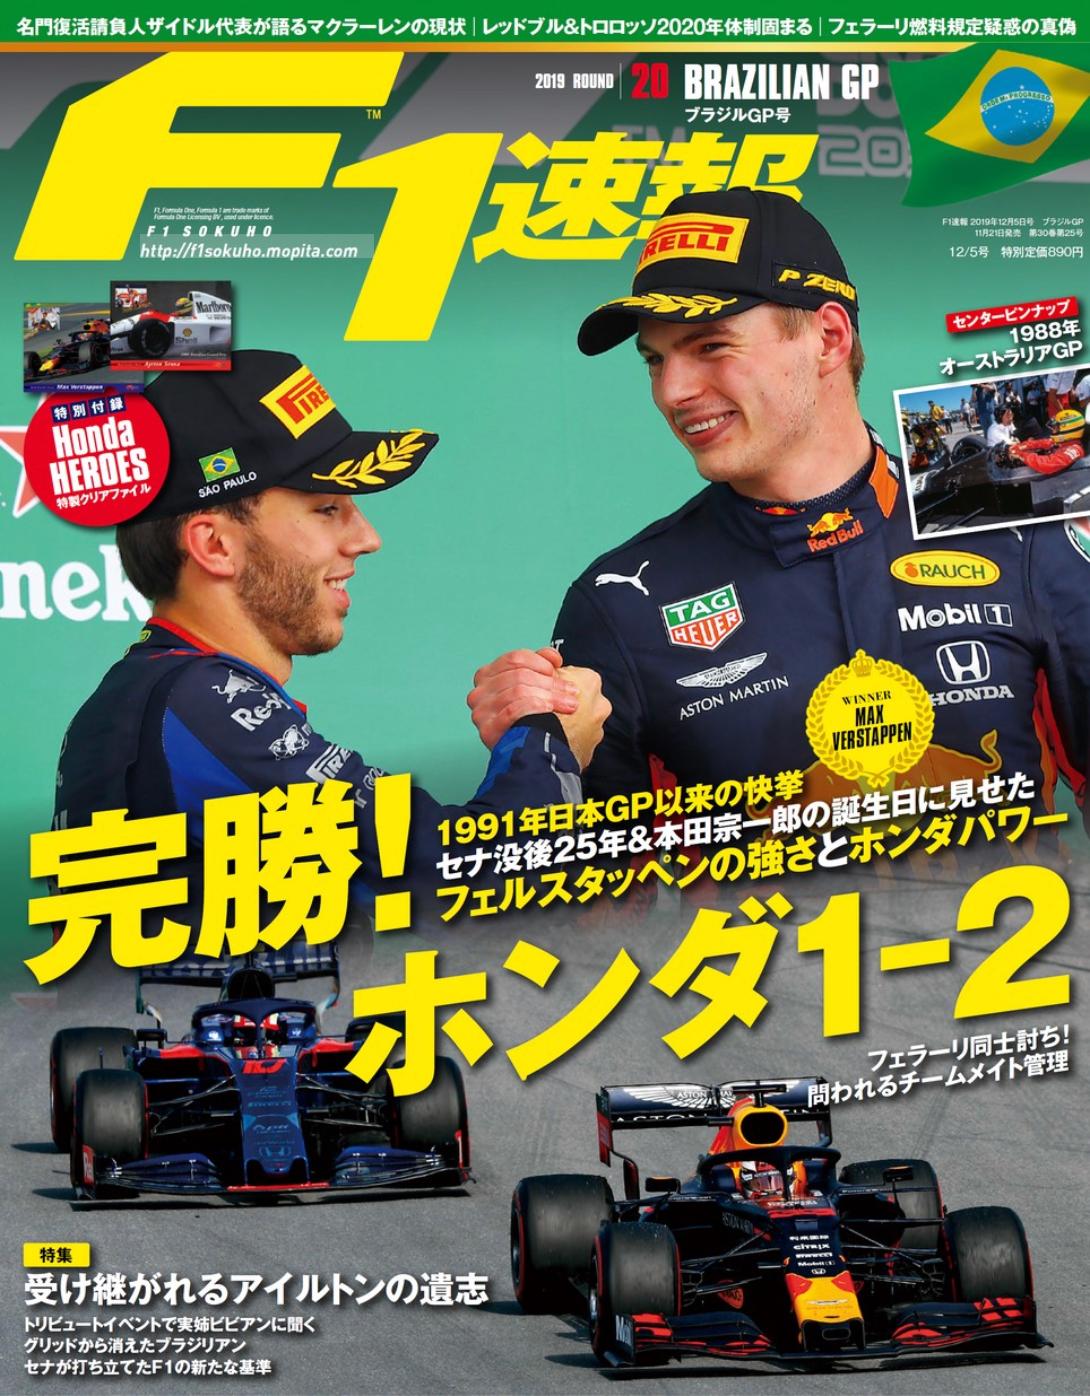 F1速報 2019年 第20戦 ブラジルGP 11月21日発売!